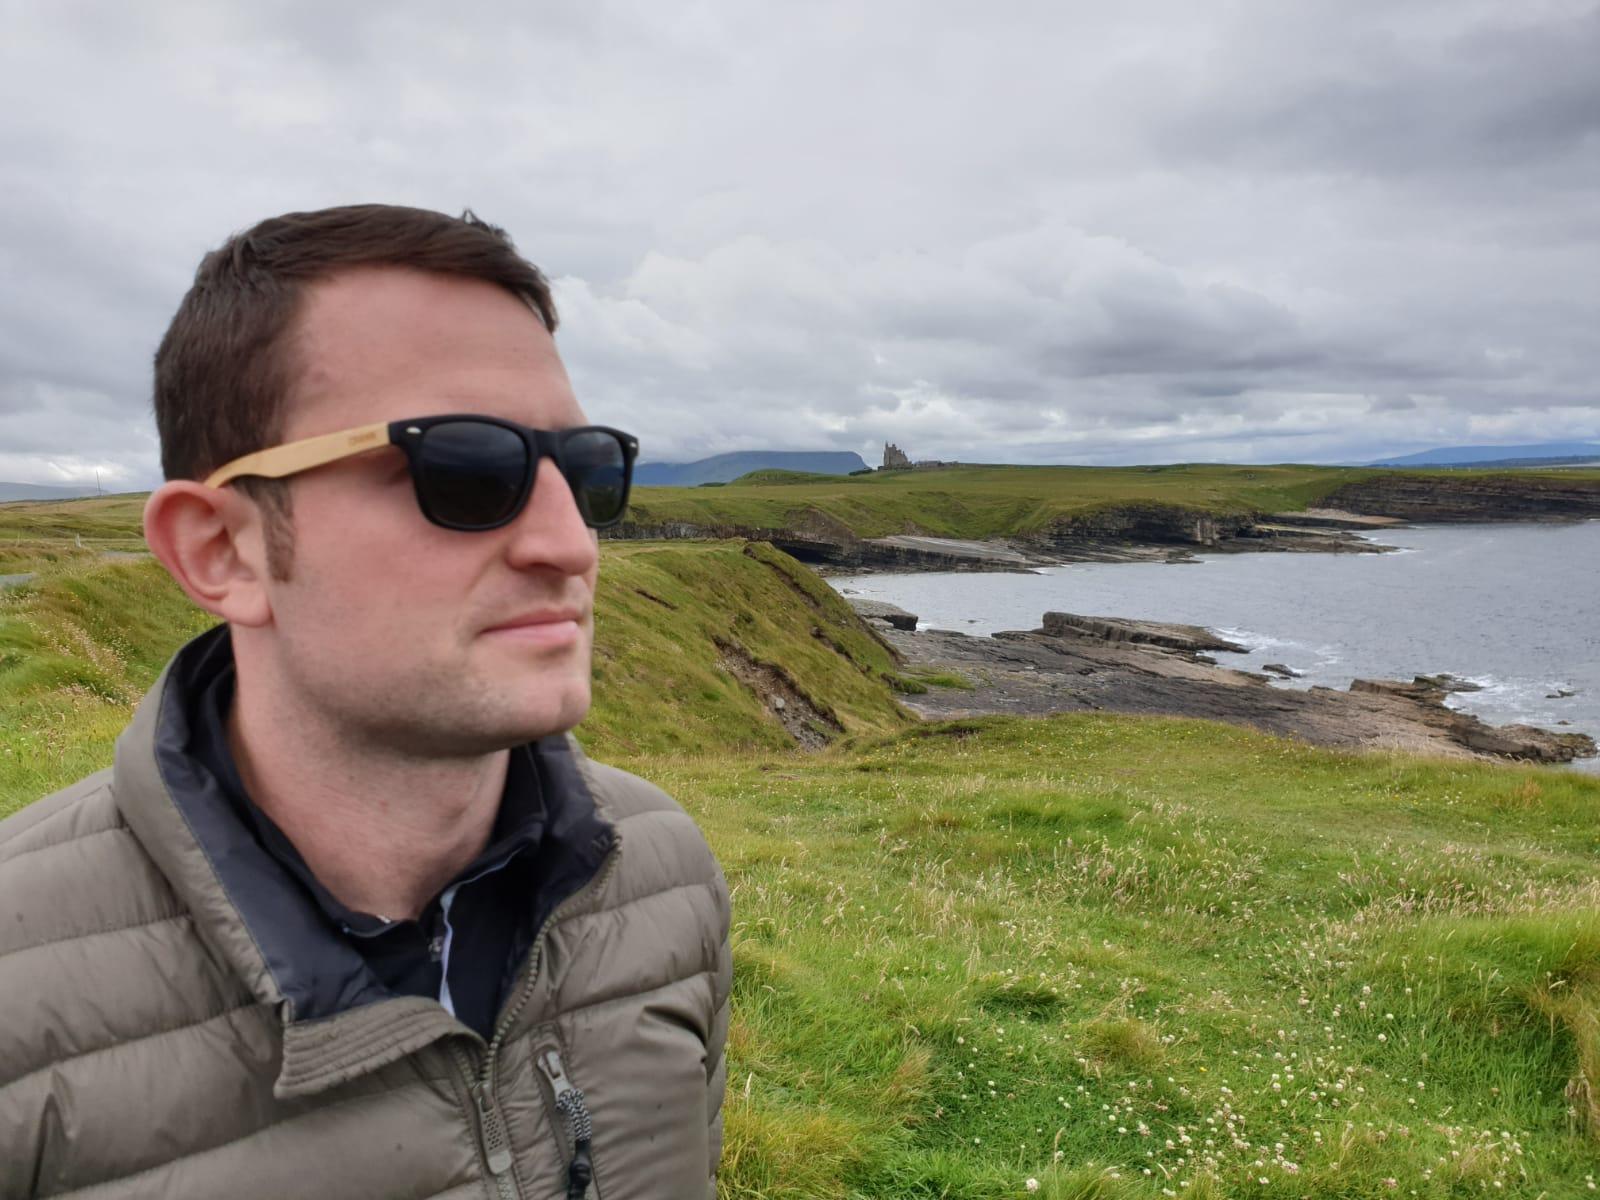 Crann Sustainable Irish Sunglasses, Blue light Glasses & Watches